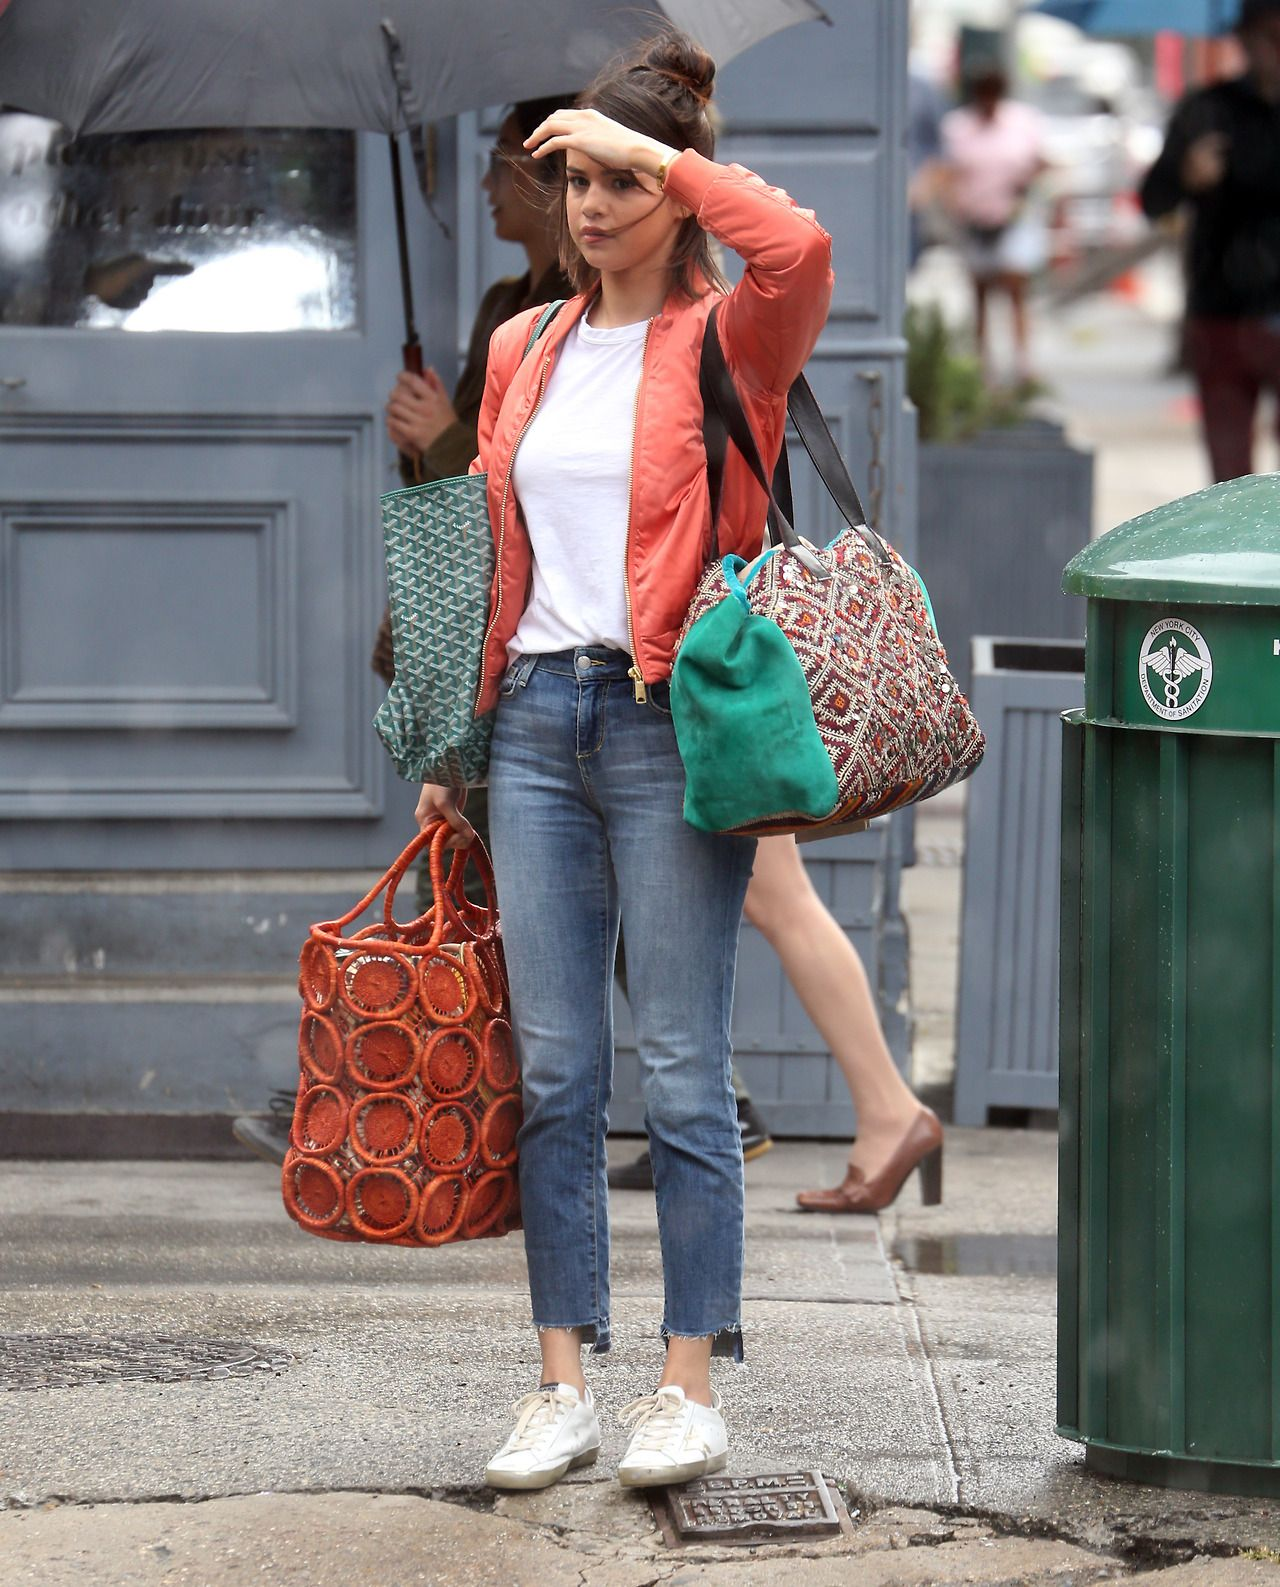 September 19: Selena on set of a movie in New York, NY